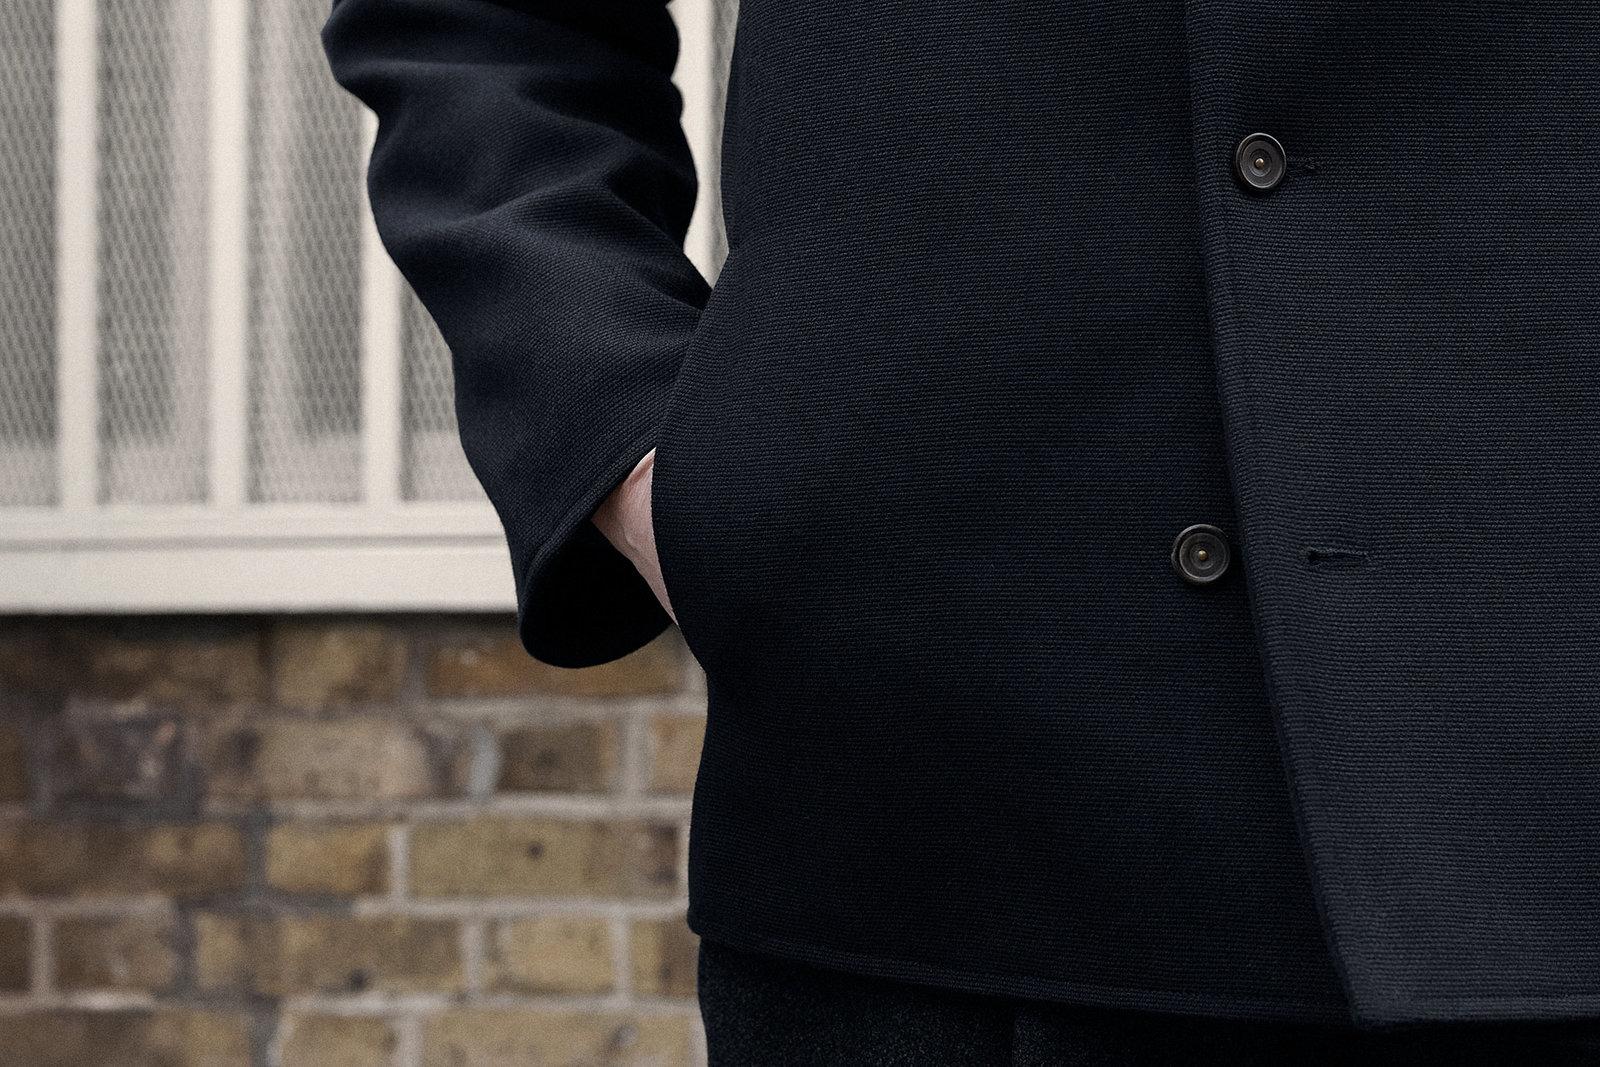 cooks-jacket-worsted-moleskin-midnight-worn-3@2x.jpg